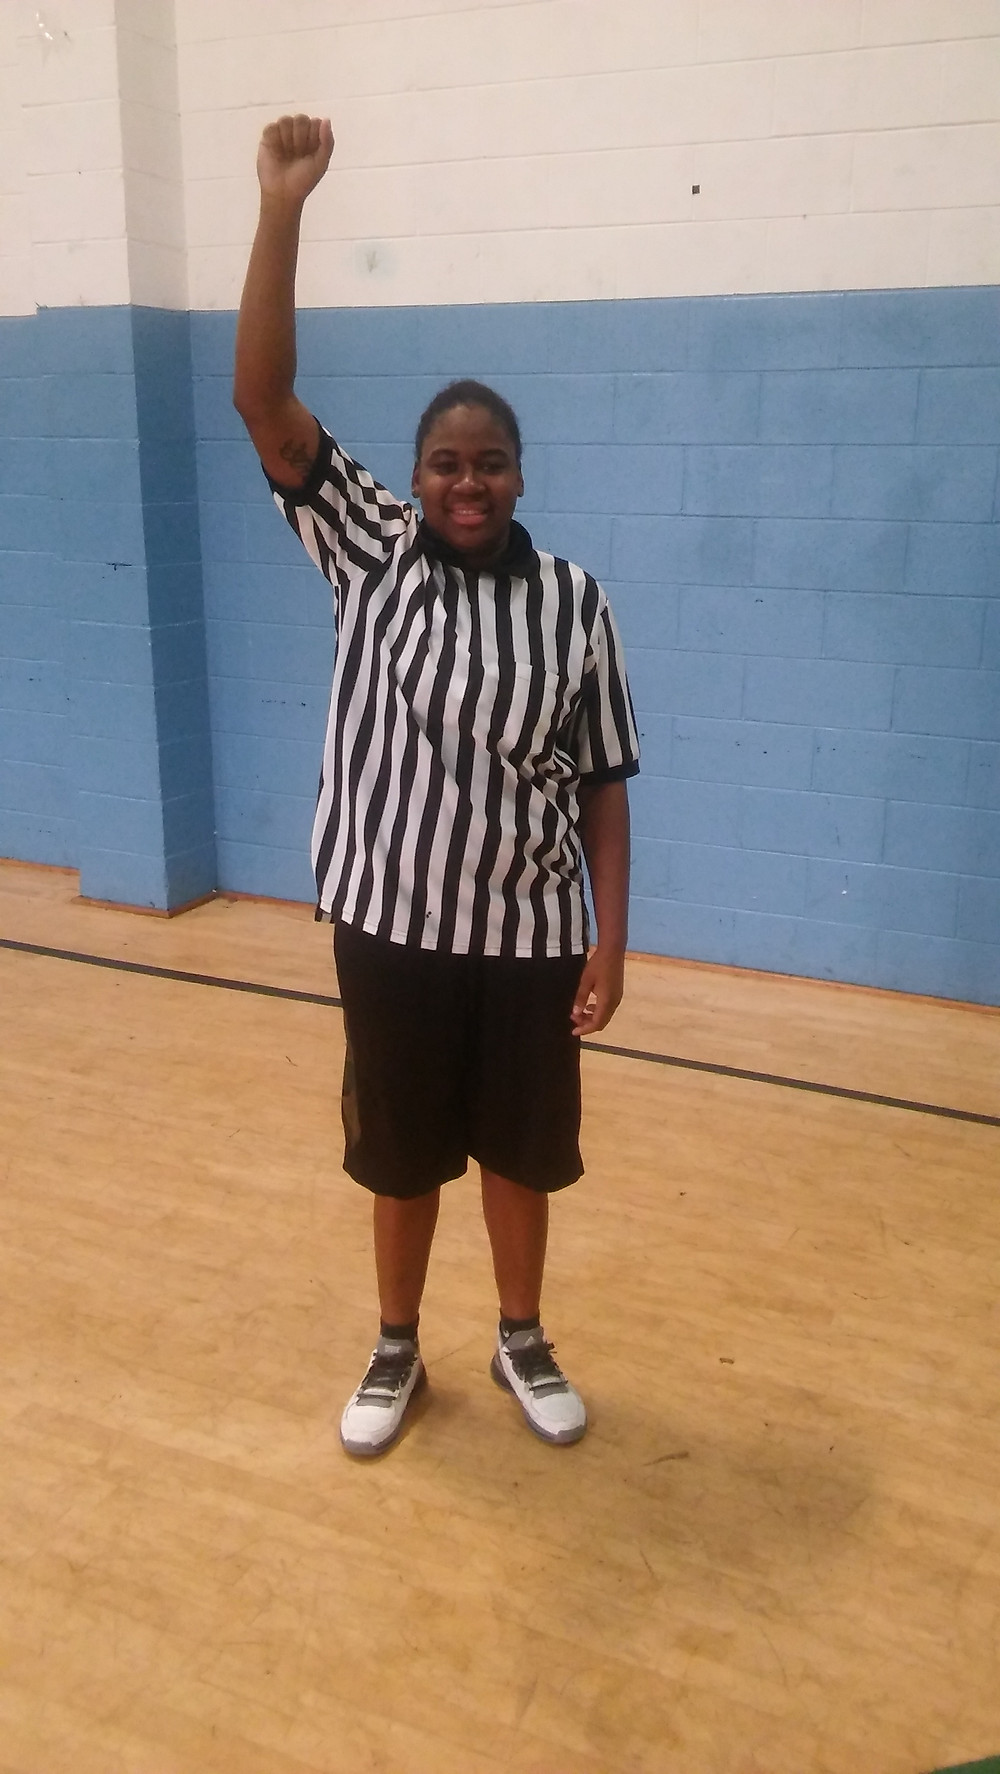 Referee Q